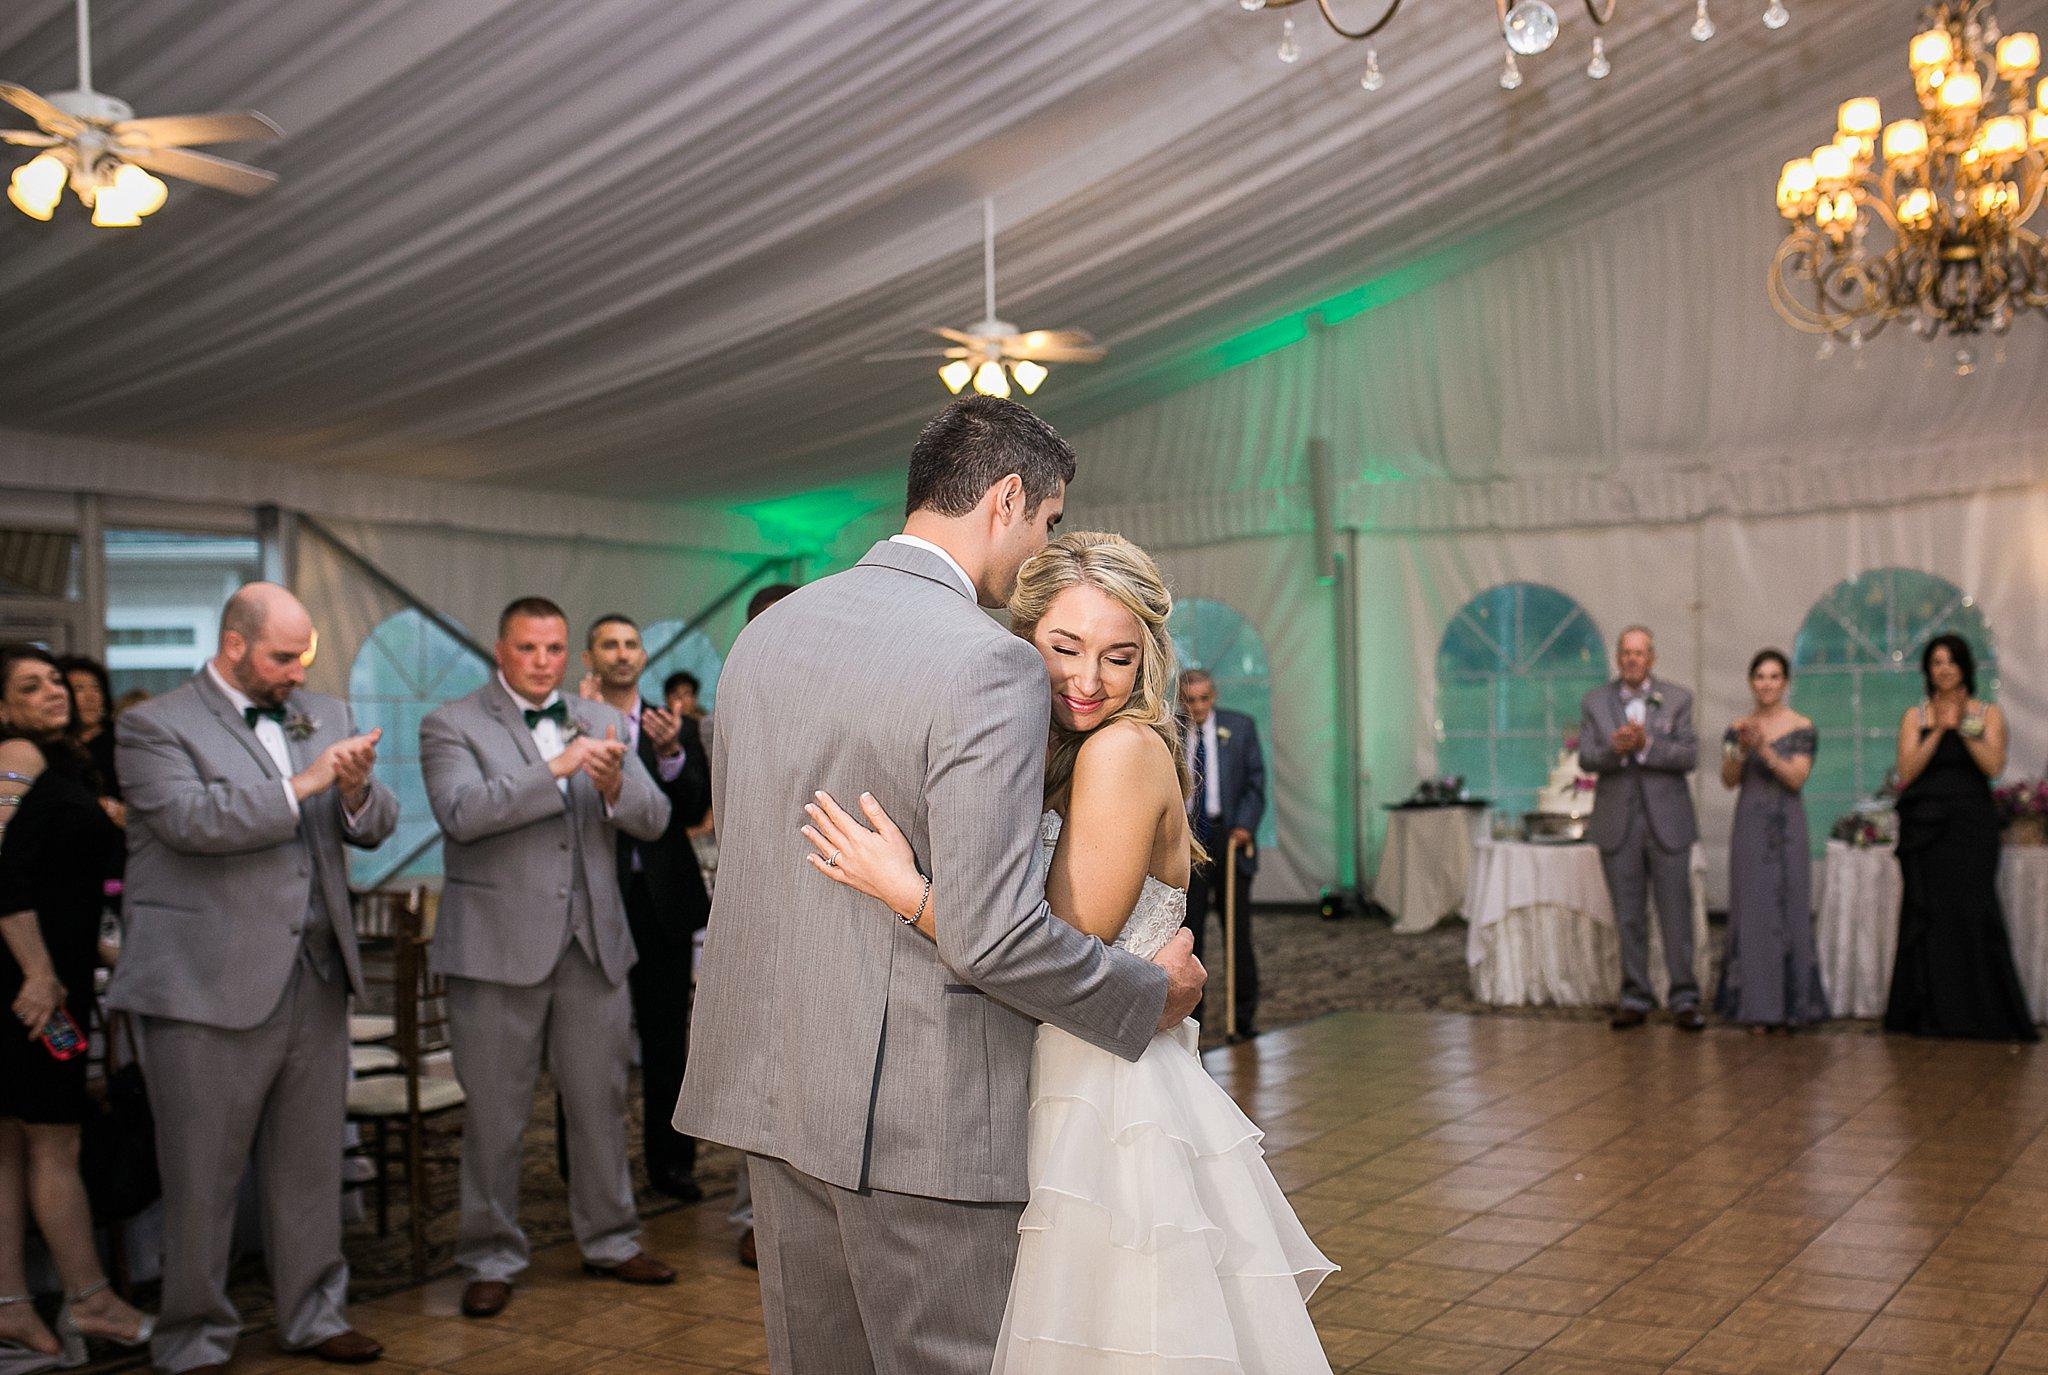 West Hills Country Club Wedding Hudson Valley Wedding Photographer Sweet Alice Photography 125.jpg